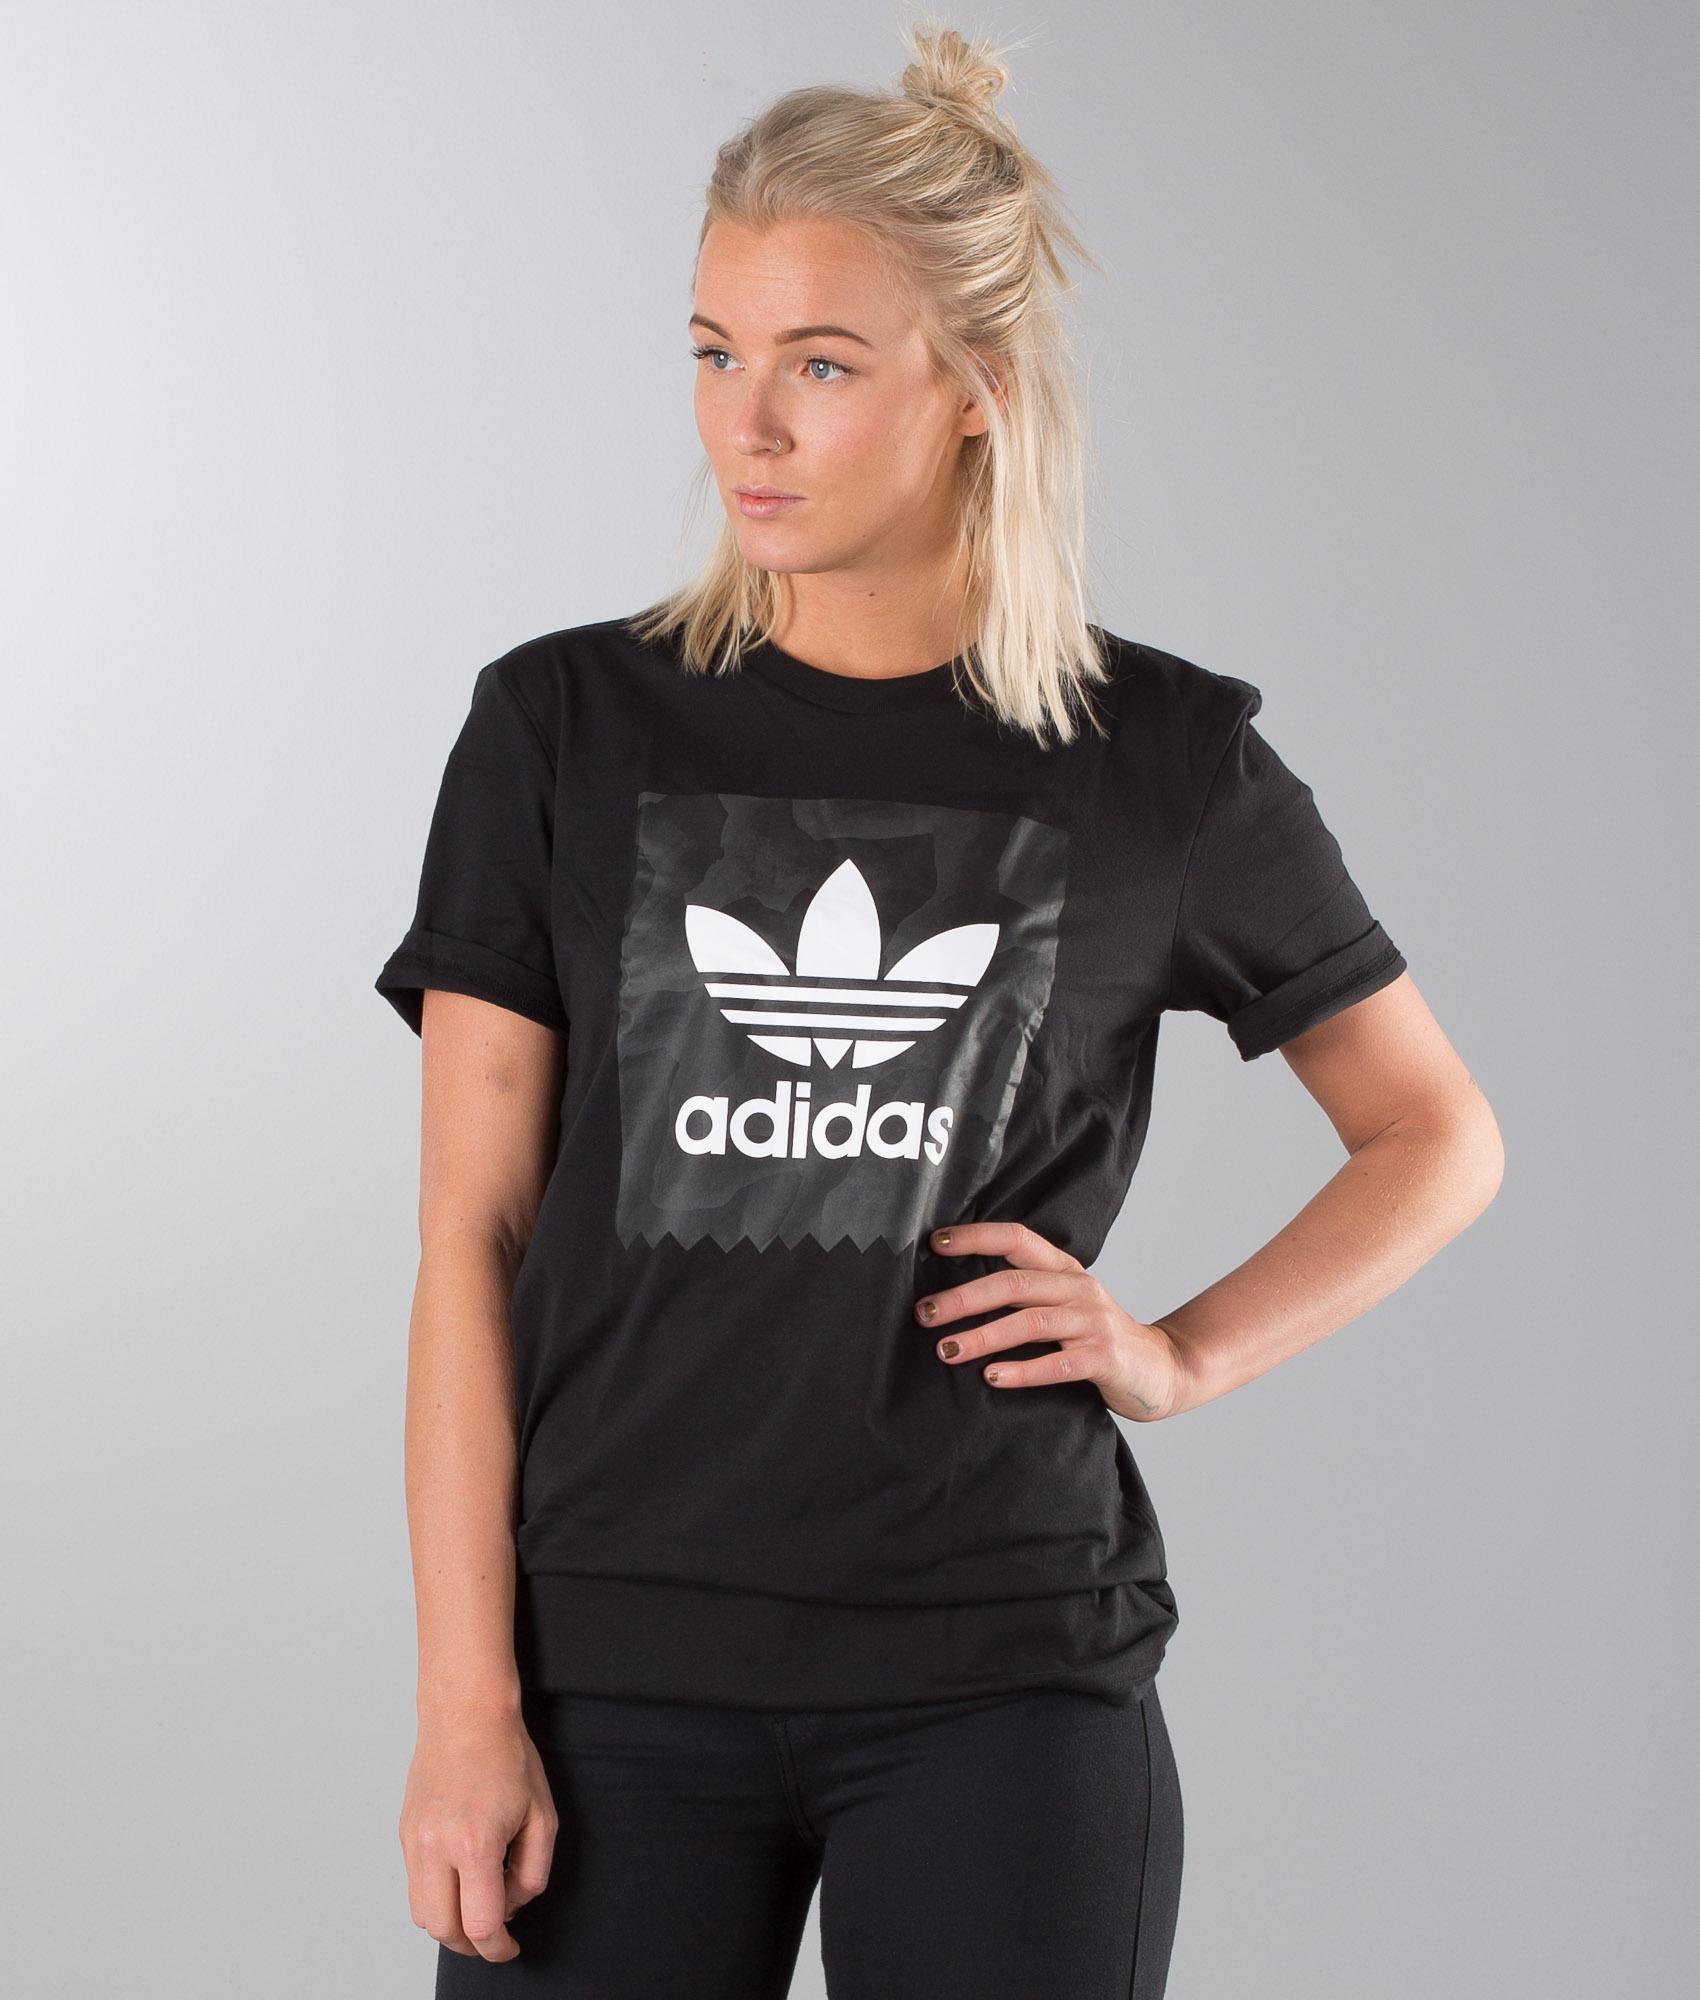 Warp Unisex Blackwhite Skateboarding T Adidas Blackbird Shirt w0fpqOxFn